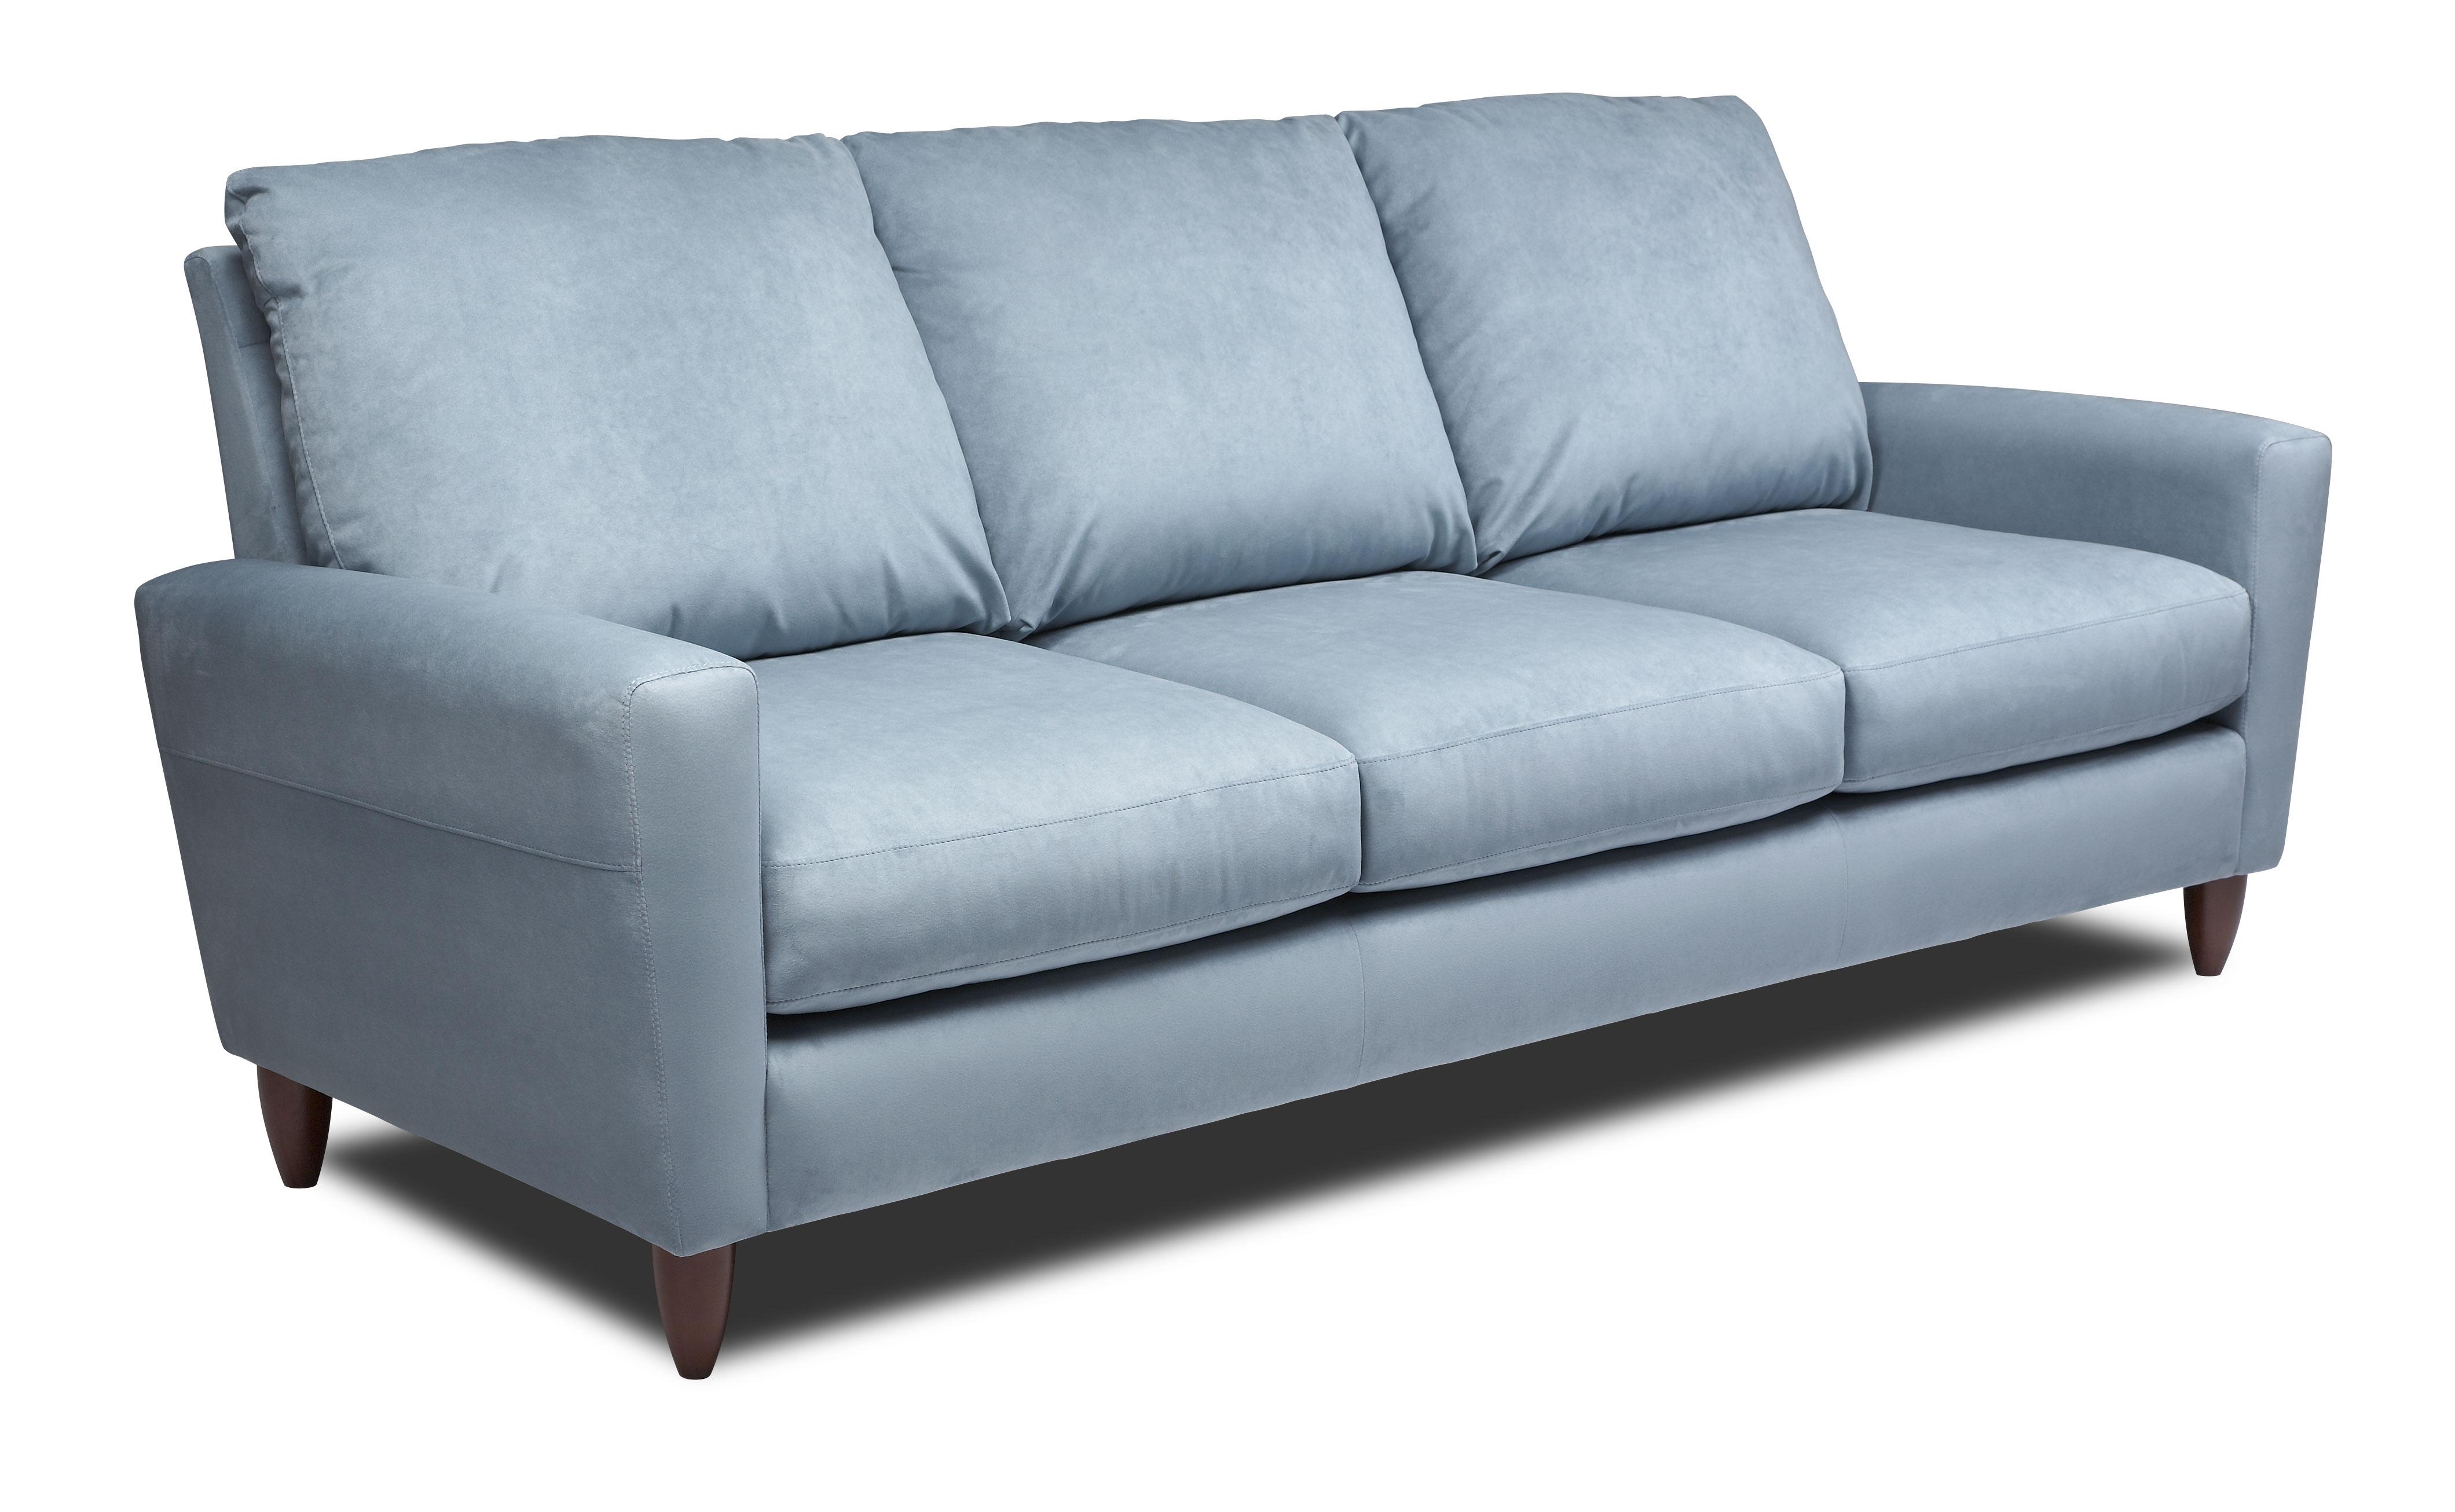 Circle Furniture Bennet Sofa Contemporary Sofas